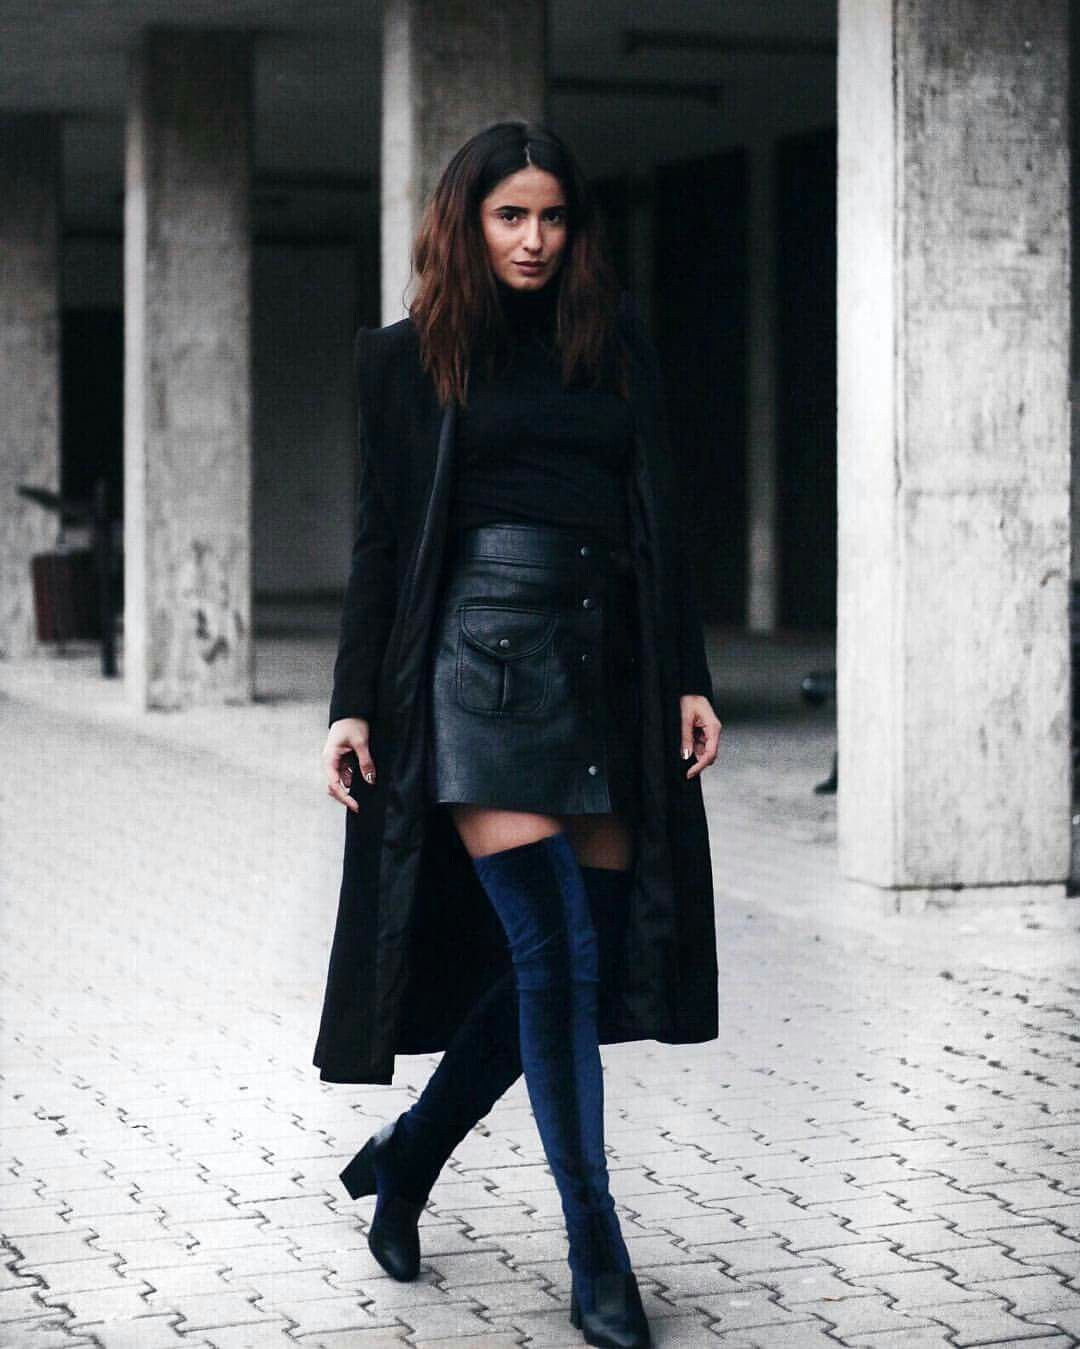 Ioana Grama Fashion Boots.  D2c91de9d8f3d7a74dcb6fd2484e4225